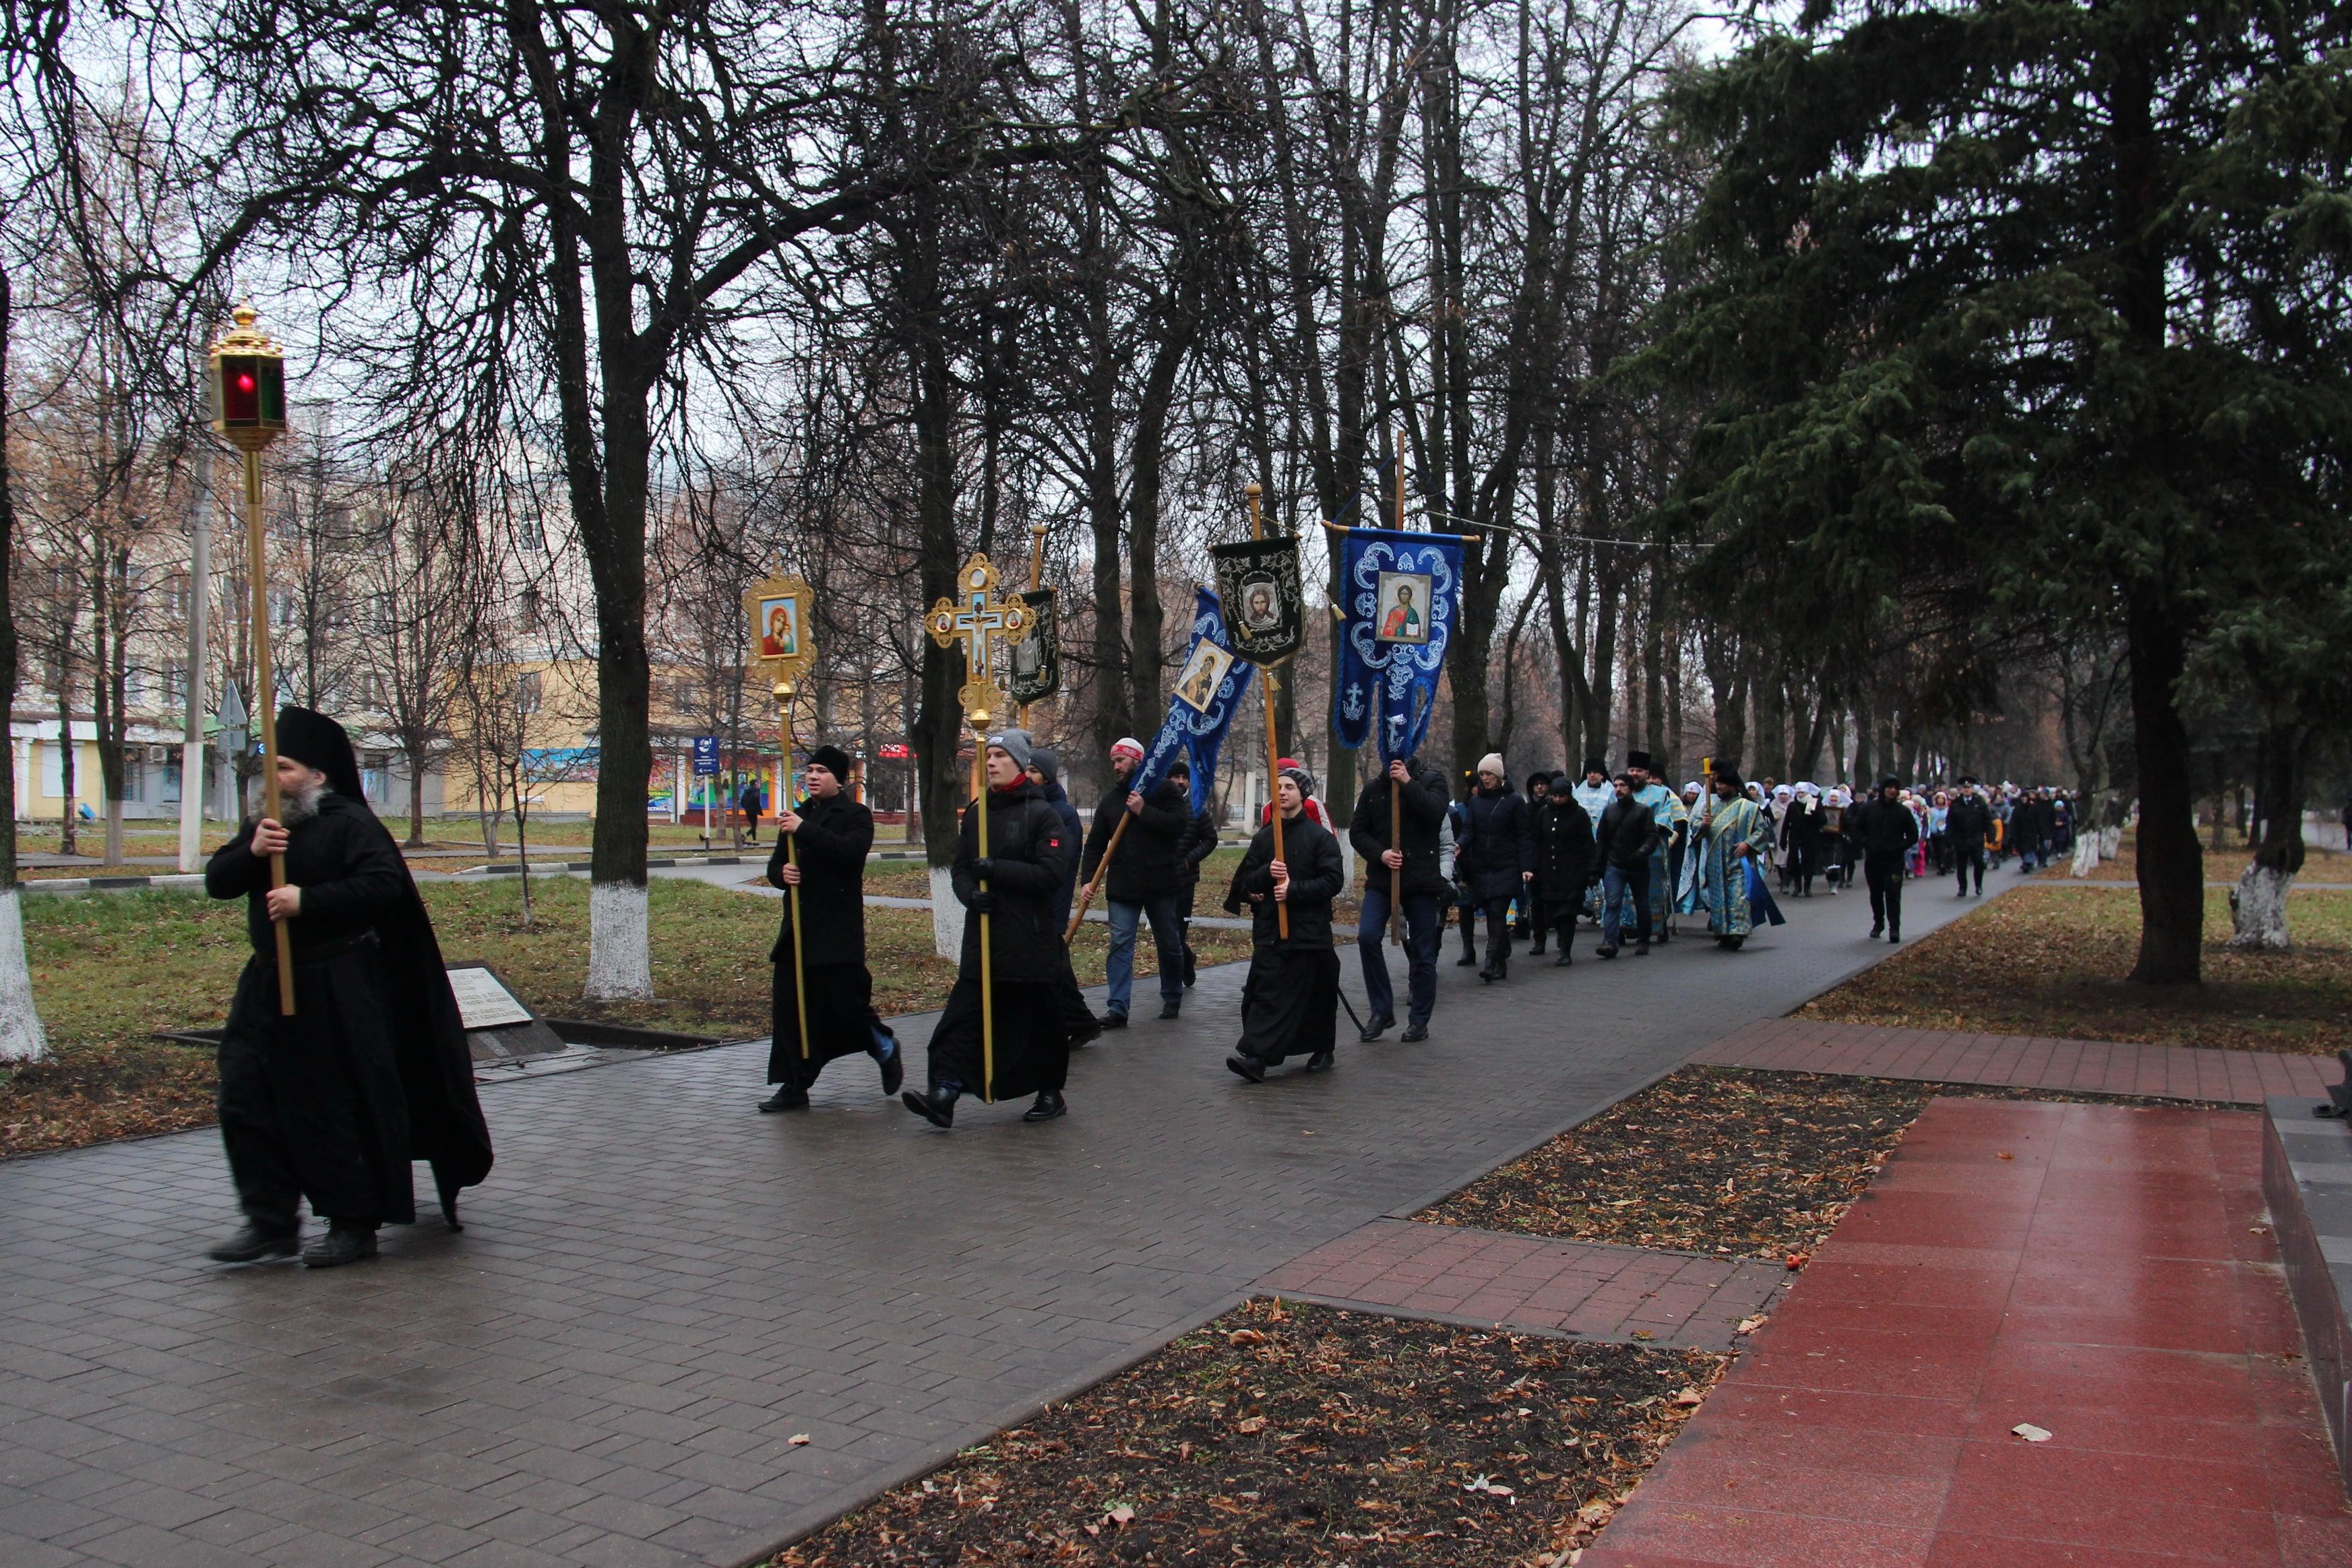 http://monuspen.ru/photoreports/e885ad143ffeae12541ceee7e7725b1x.JPG